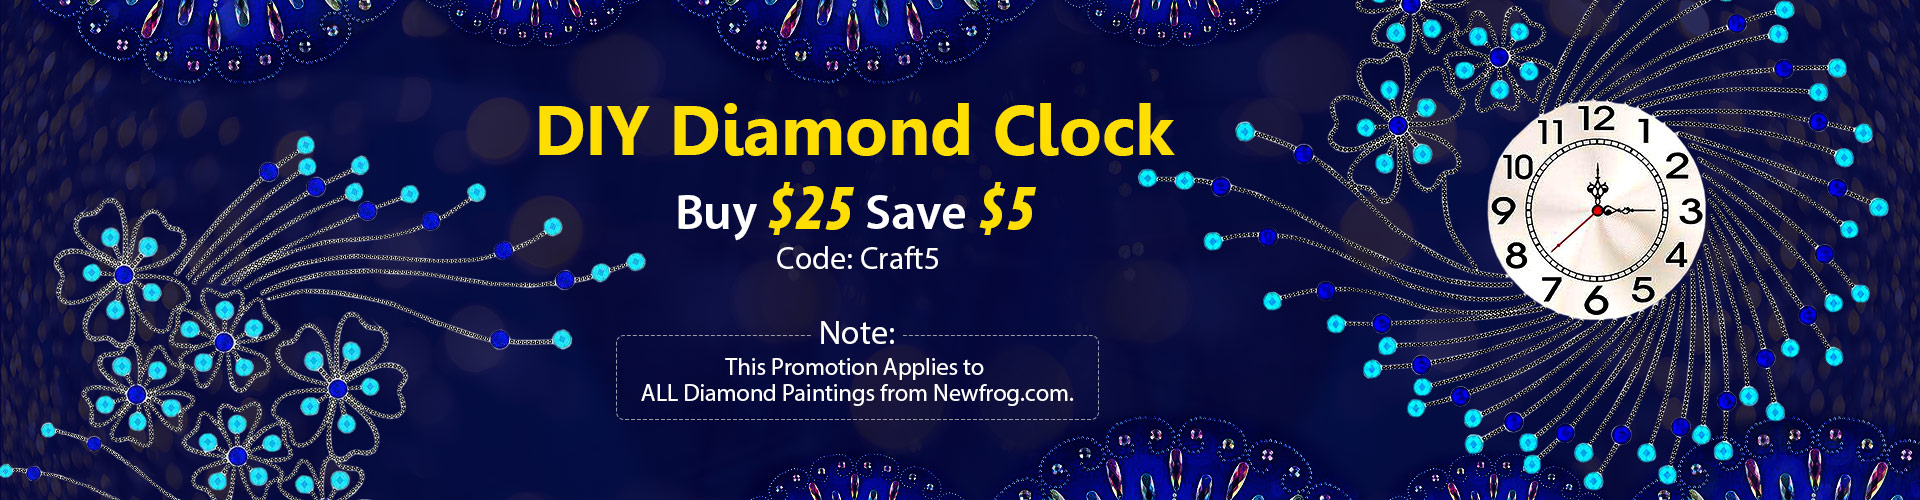 DIY Diamond Clock